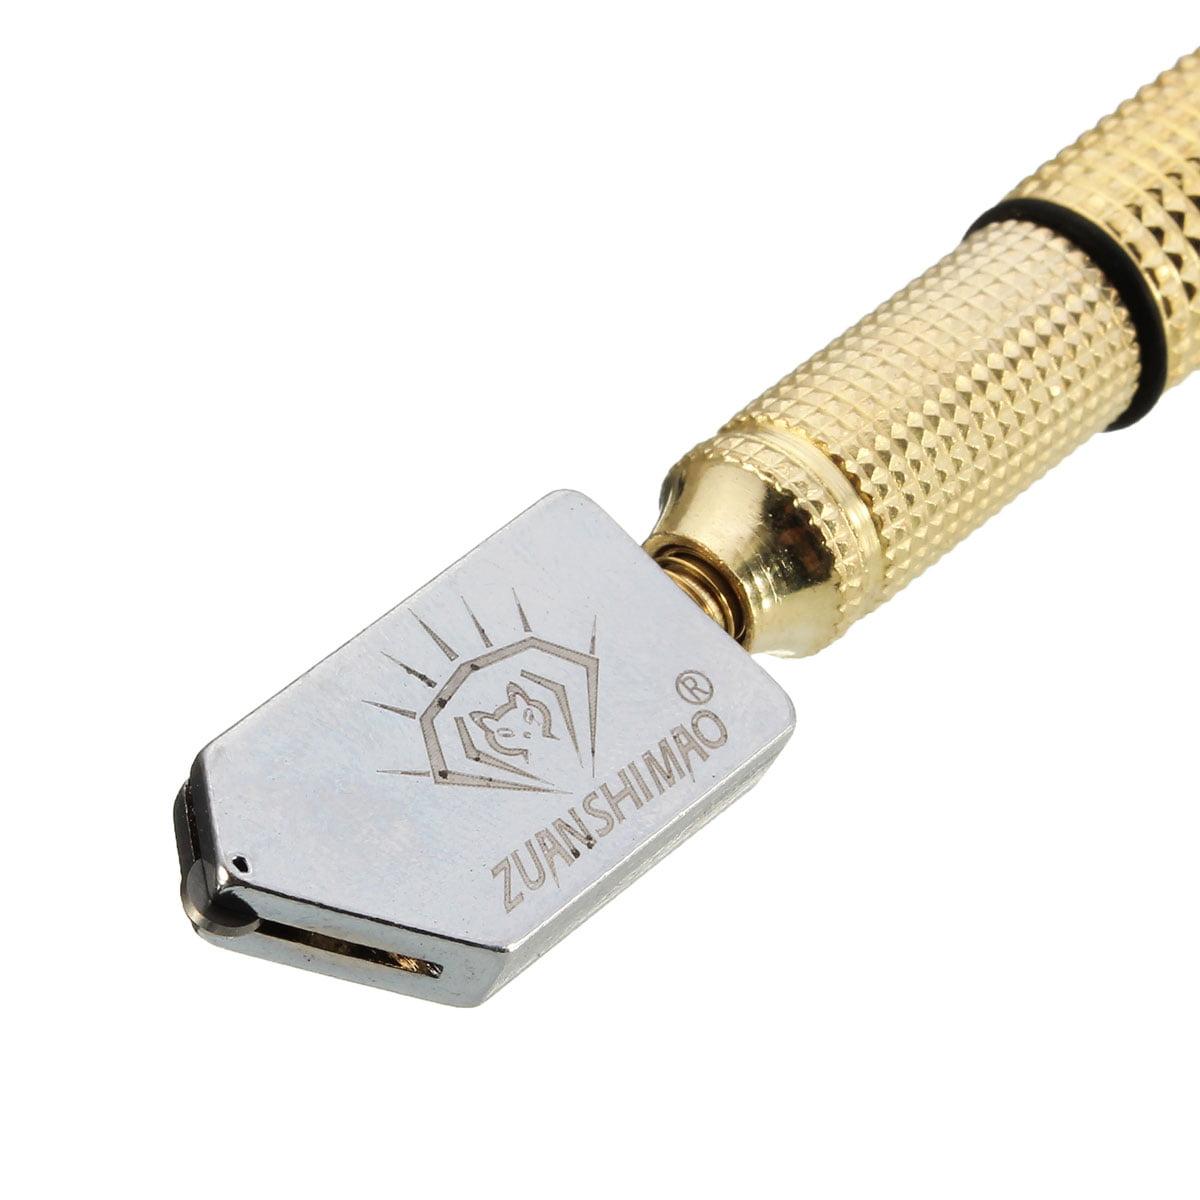 Diamond Tip Antislip Metal Handle Steel Blade Oil Feed Glass Cutter Cutting